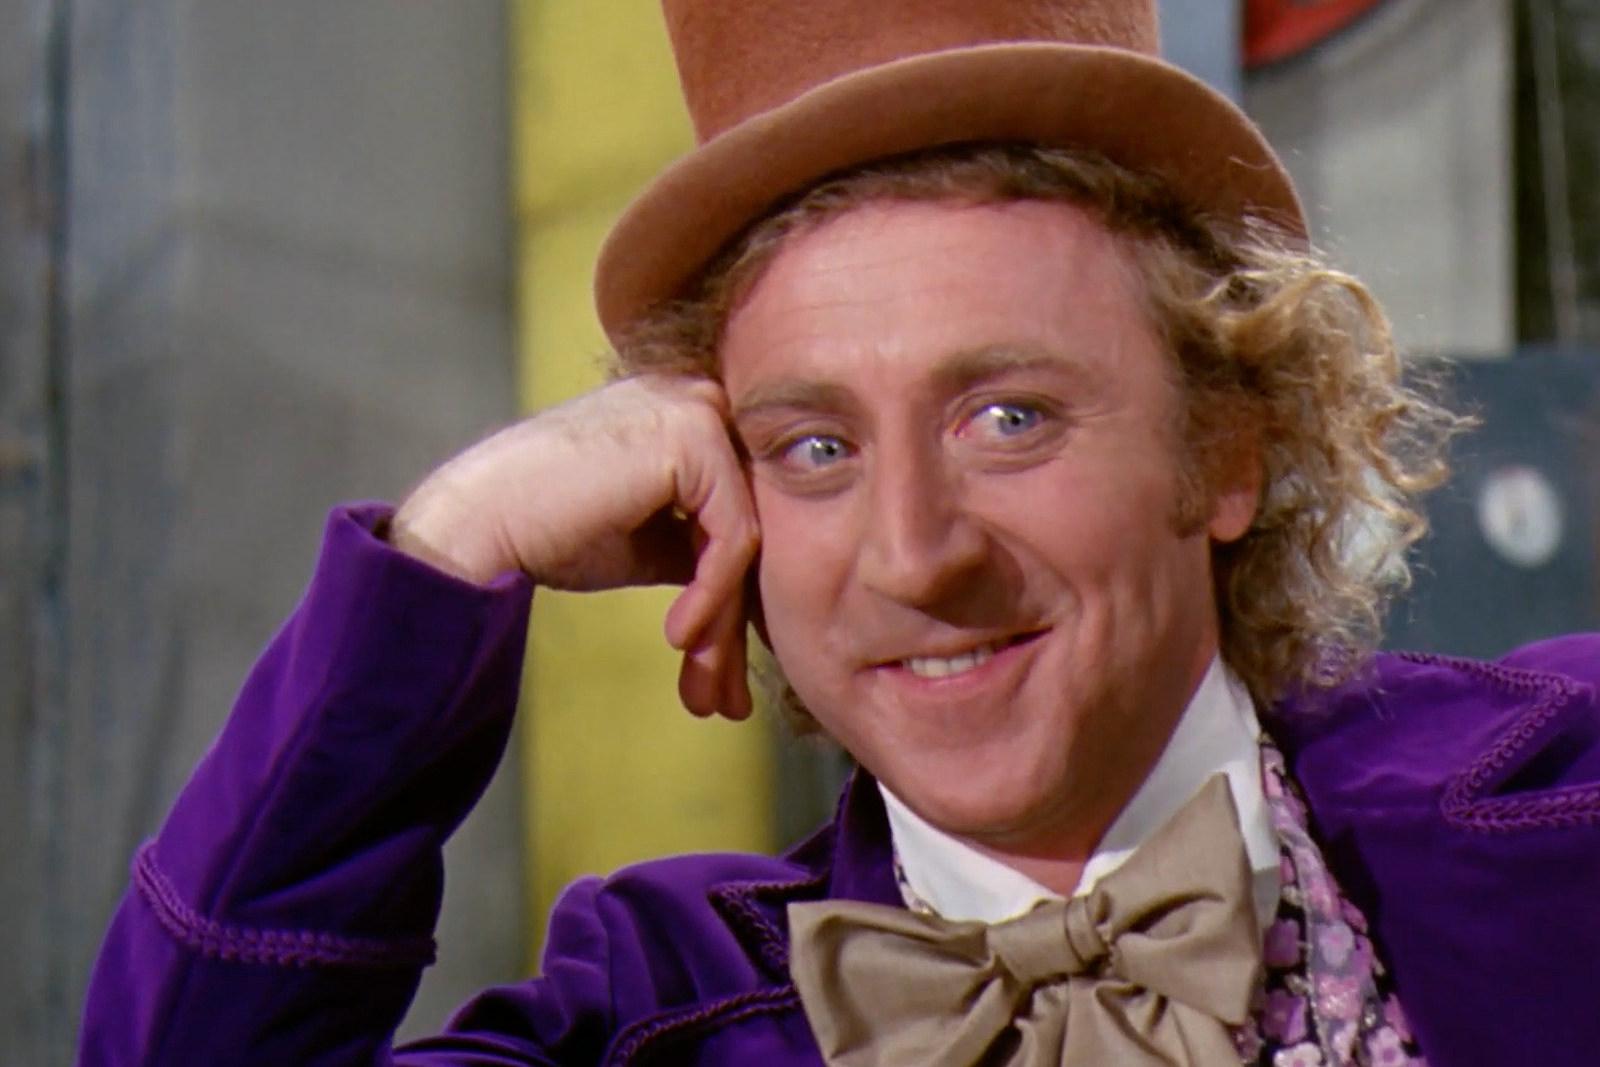 50 Years Ago: Gene Wilder Adds Mystery, Mischief to 'Willy Wonka'